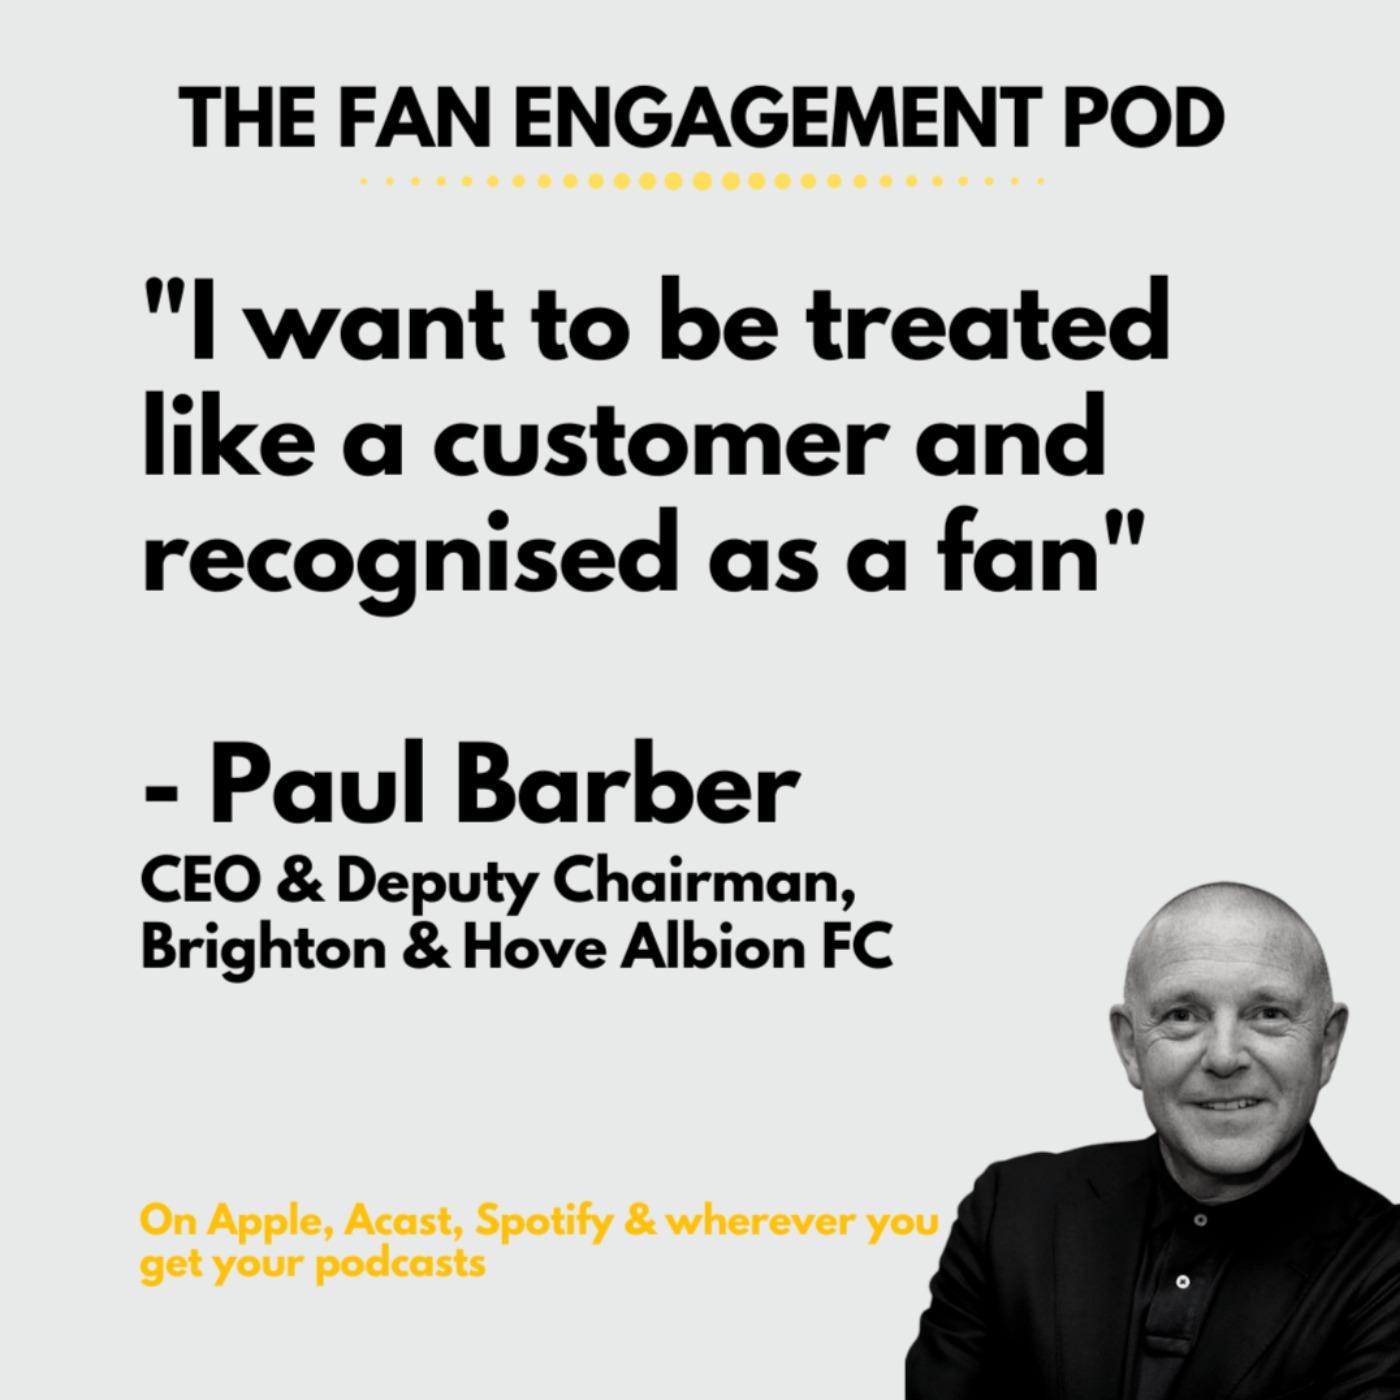 Paul Barber: Leadership in Fan Engagement